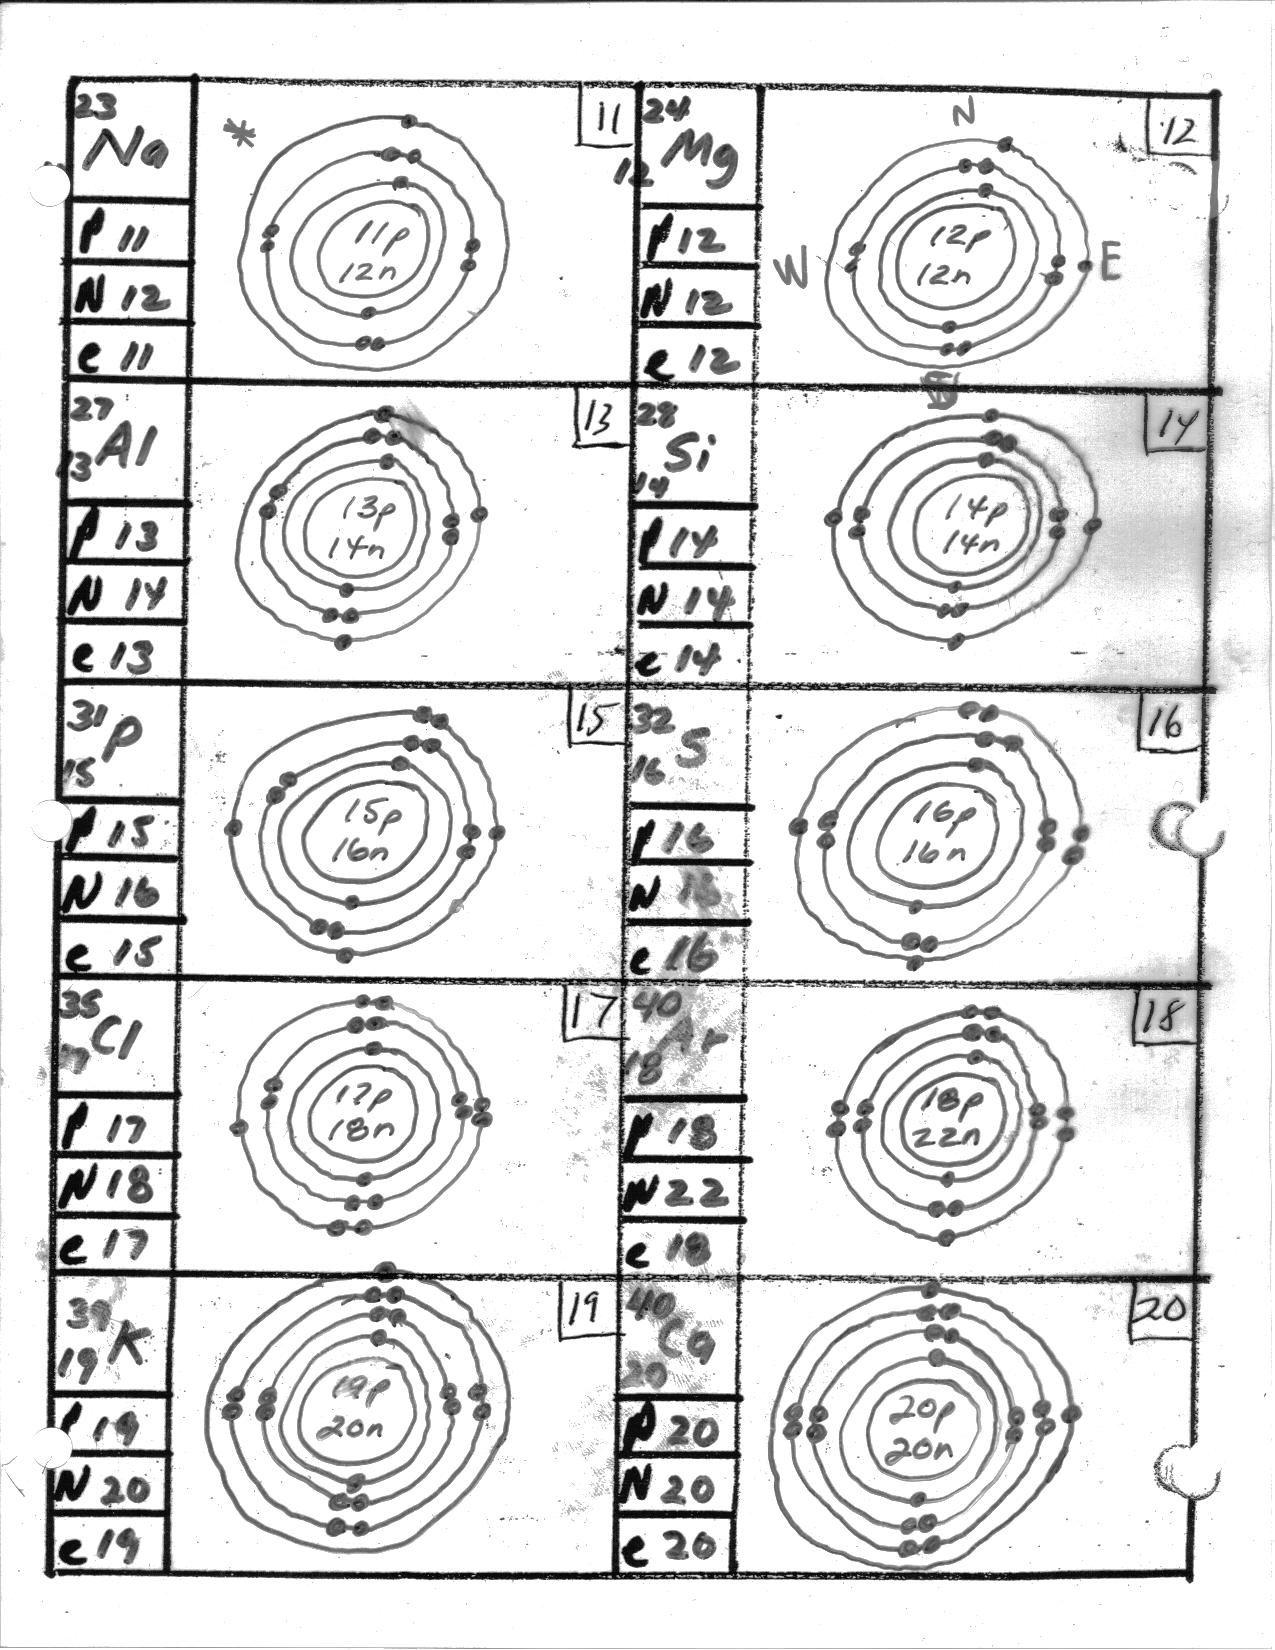 Bohr Model Of The Atom Worksheets